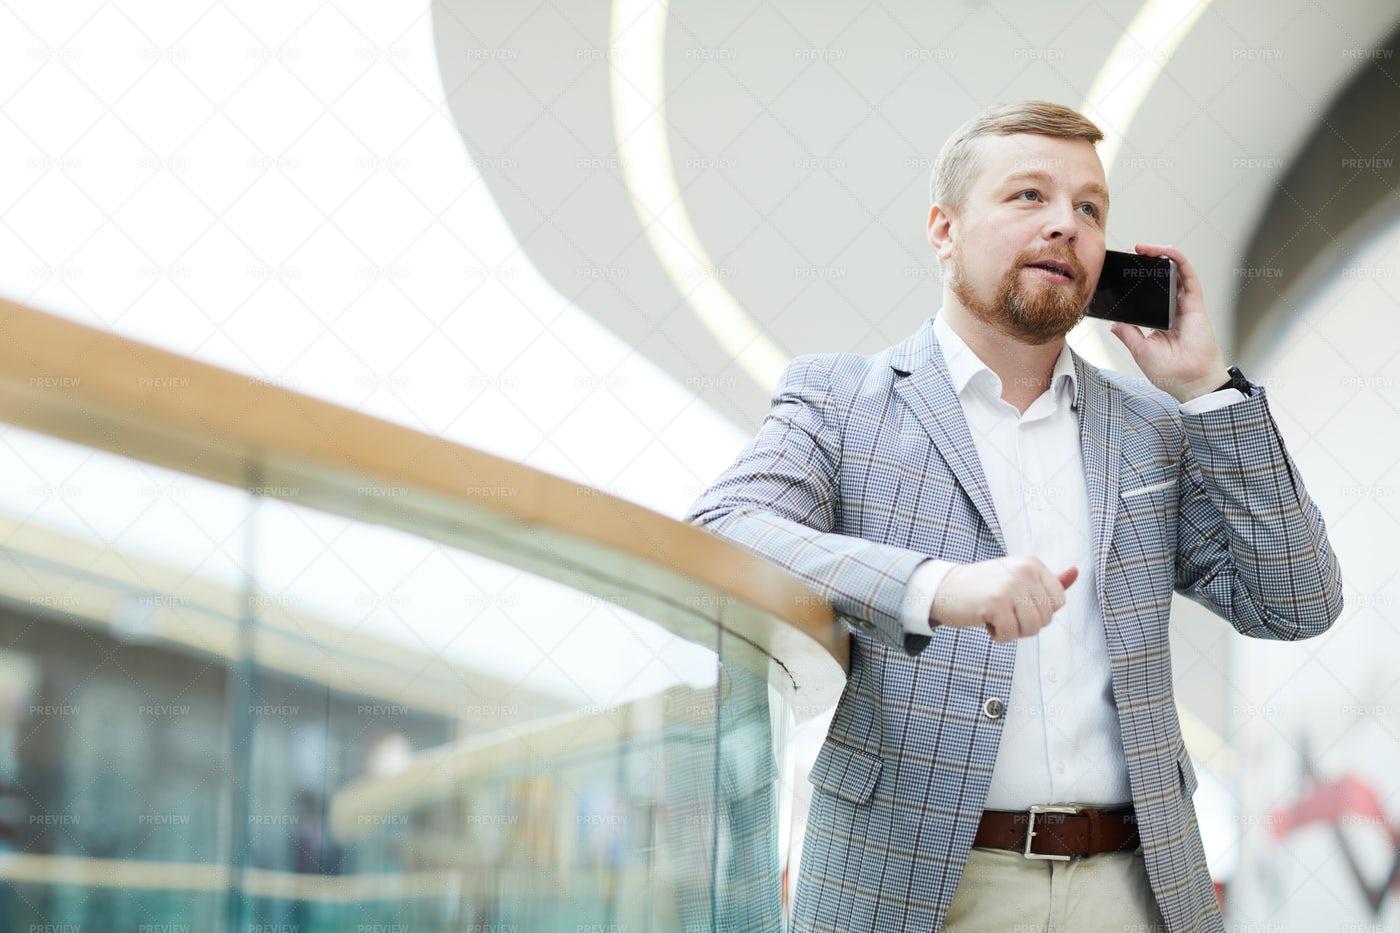 Busy Entrepreneur Talking On Phone: Stock Photos